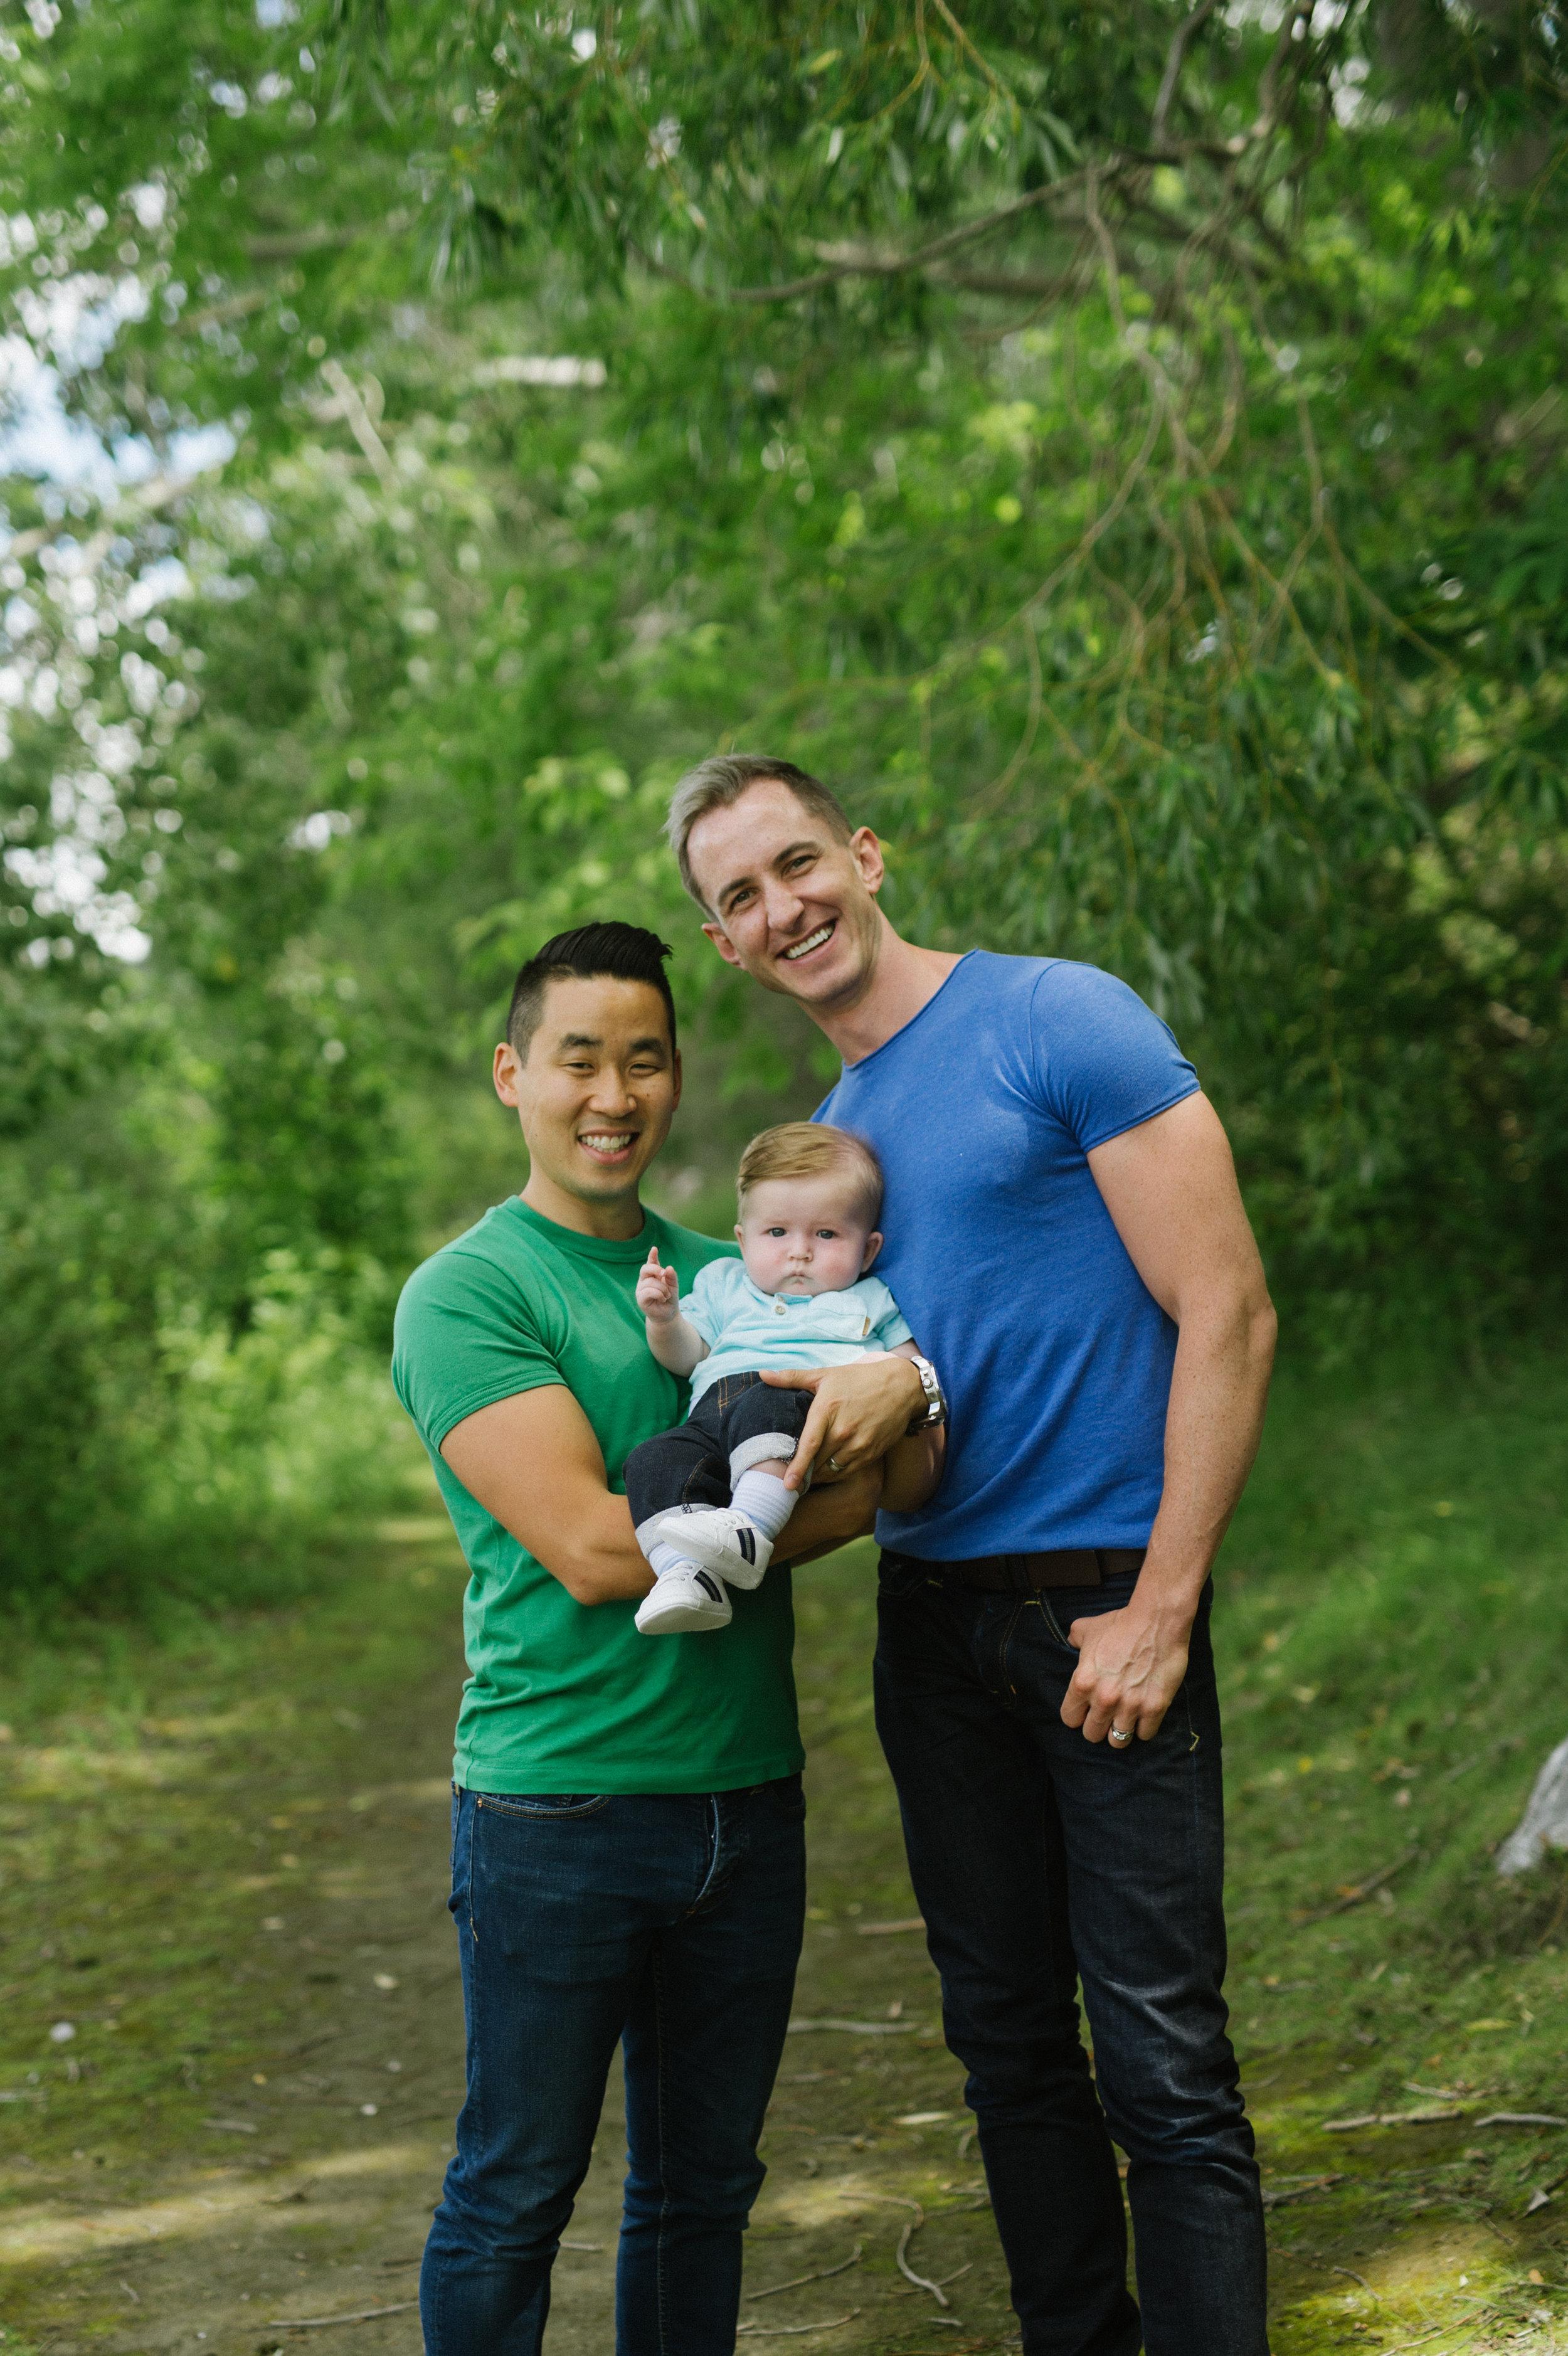 Calgary_Family_Photography_Adam_Jarom_Family_Portraits_2018_HR075.jpg